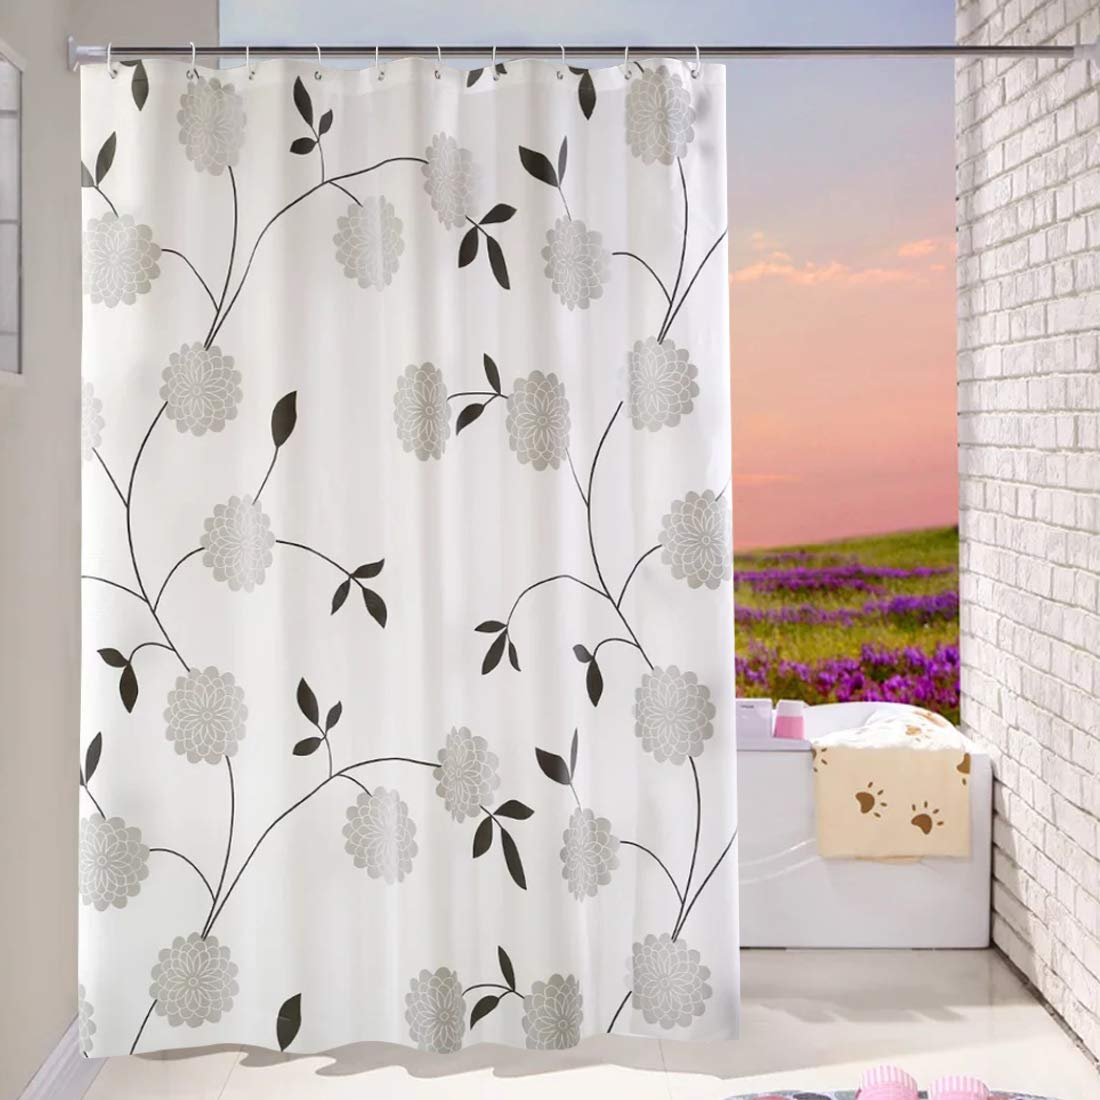 WEIXINHAI Shower Curtain Curtain for Shower Bath Curtains 72 x 72 inch - 100% PEVA 3D Effect Design Waterproof Bath Shower Curtain Liner, Eco-Friendly, Rust Proof Grommets